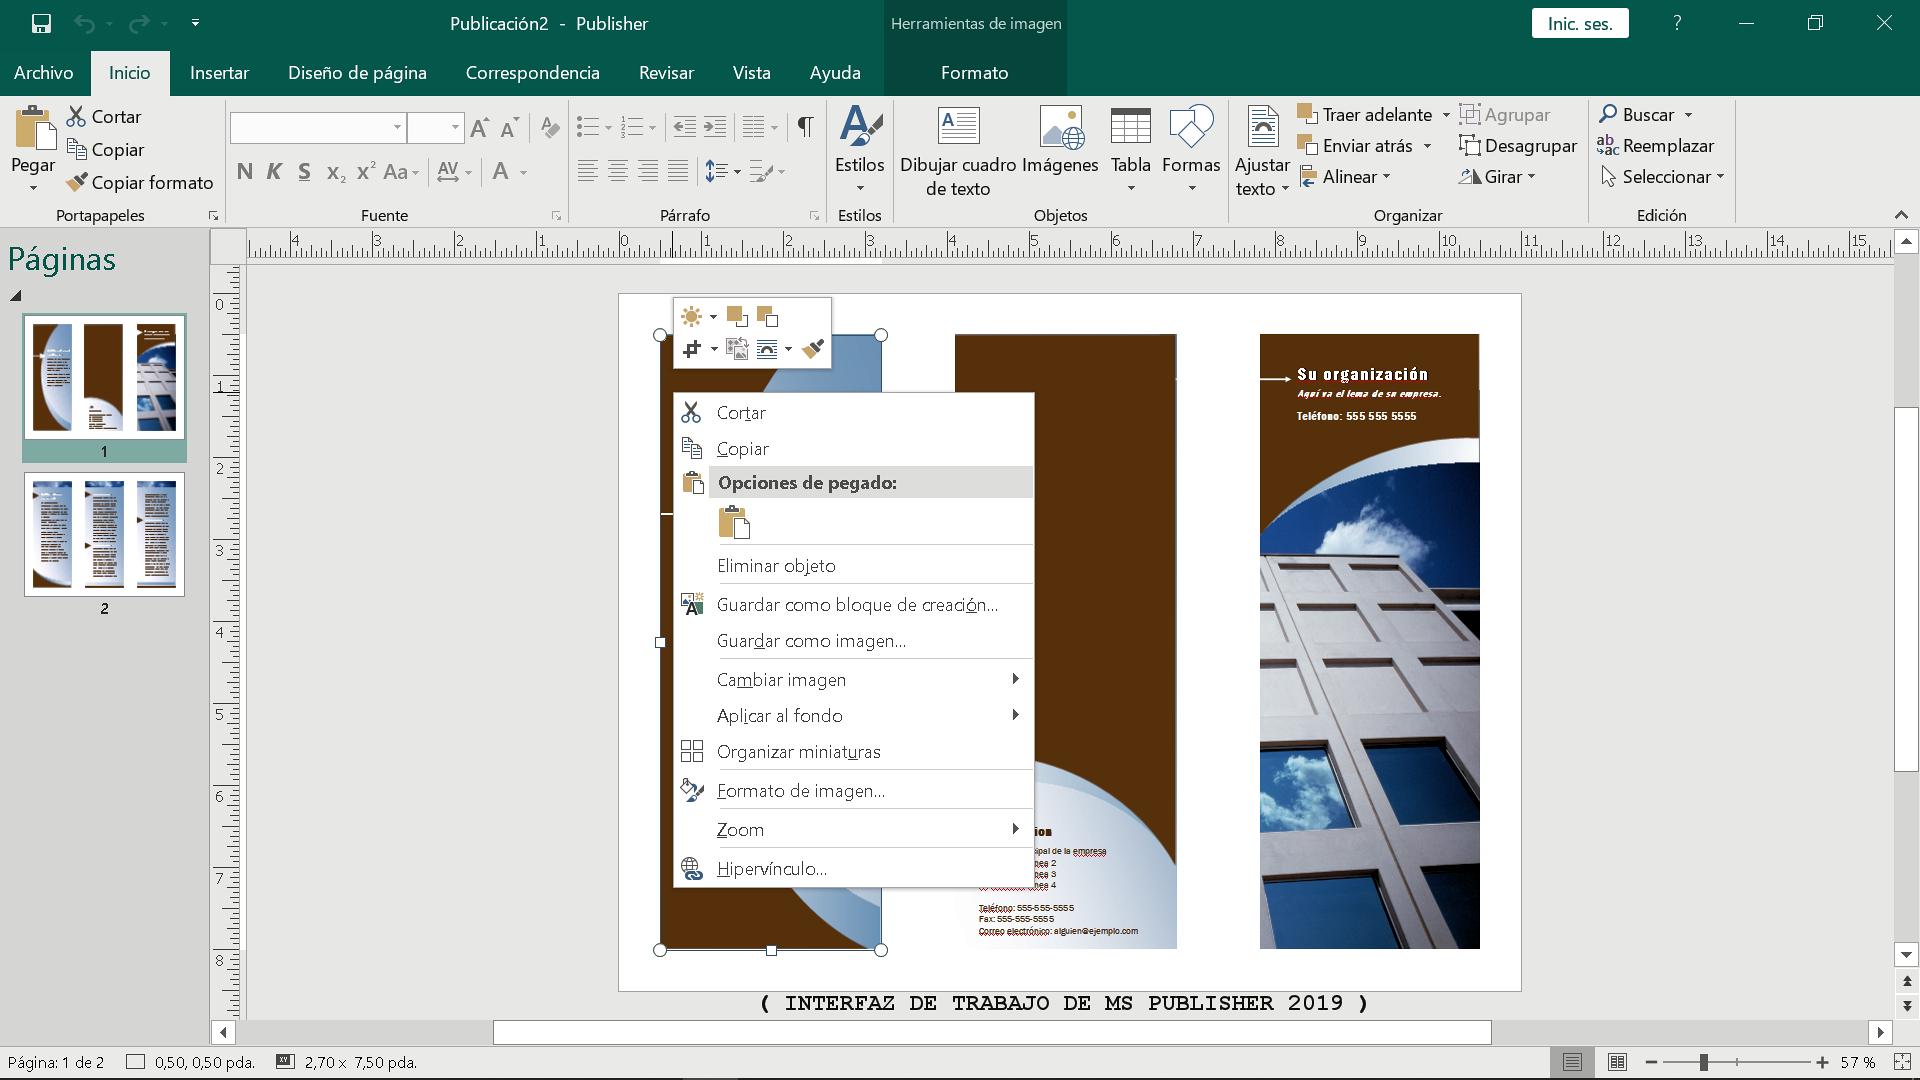 Interfaz de trabajo de Ms Publisher